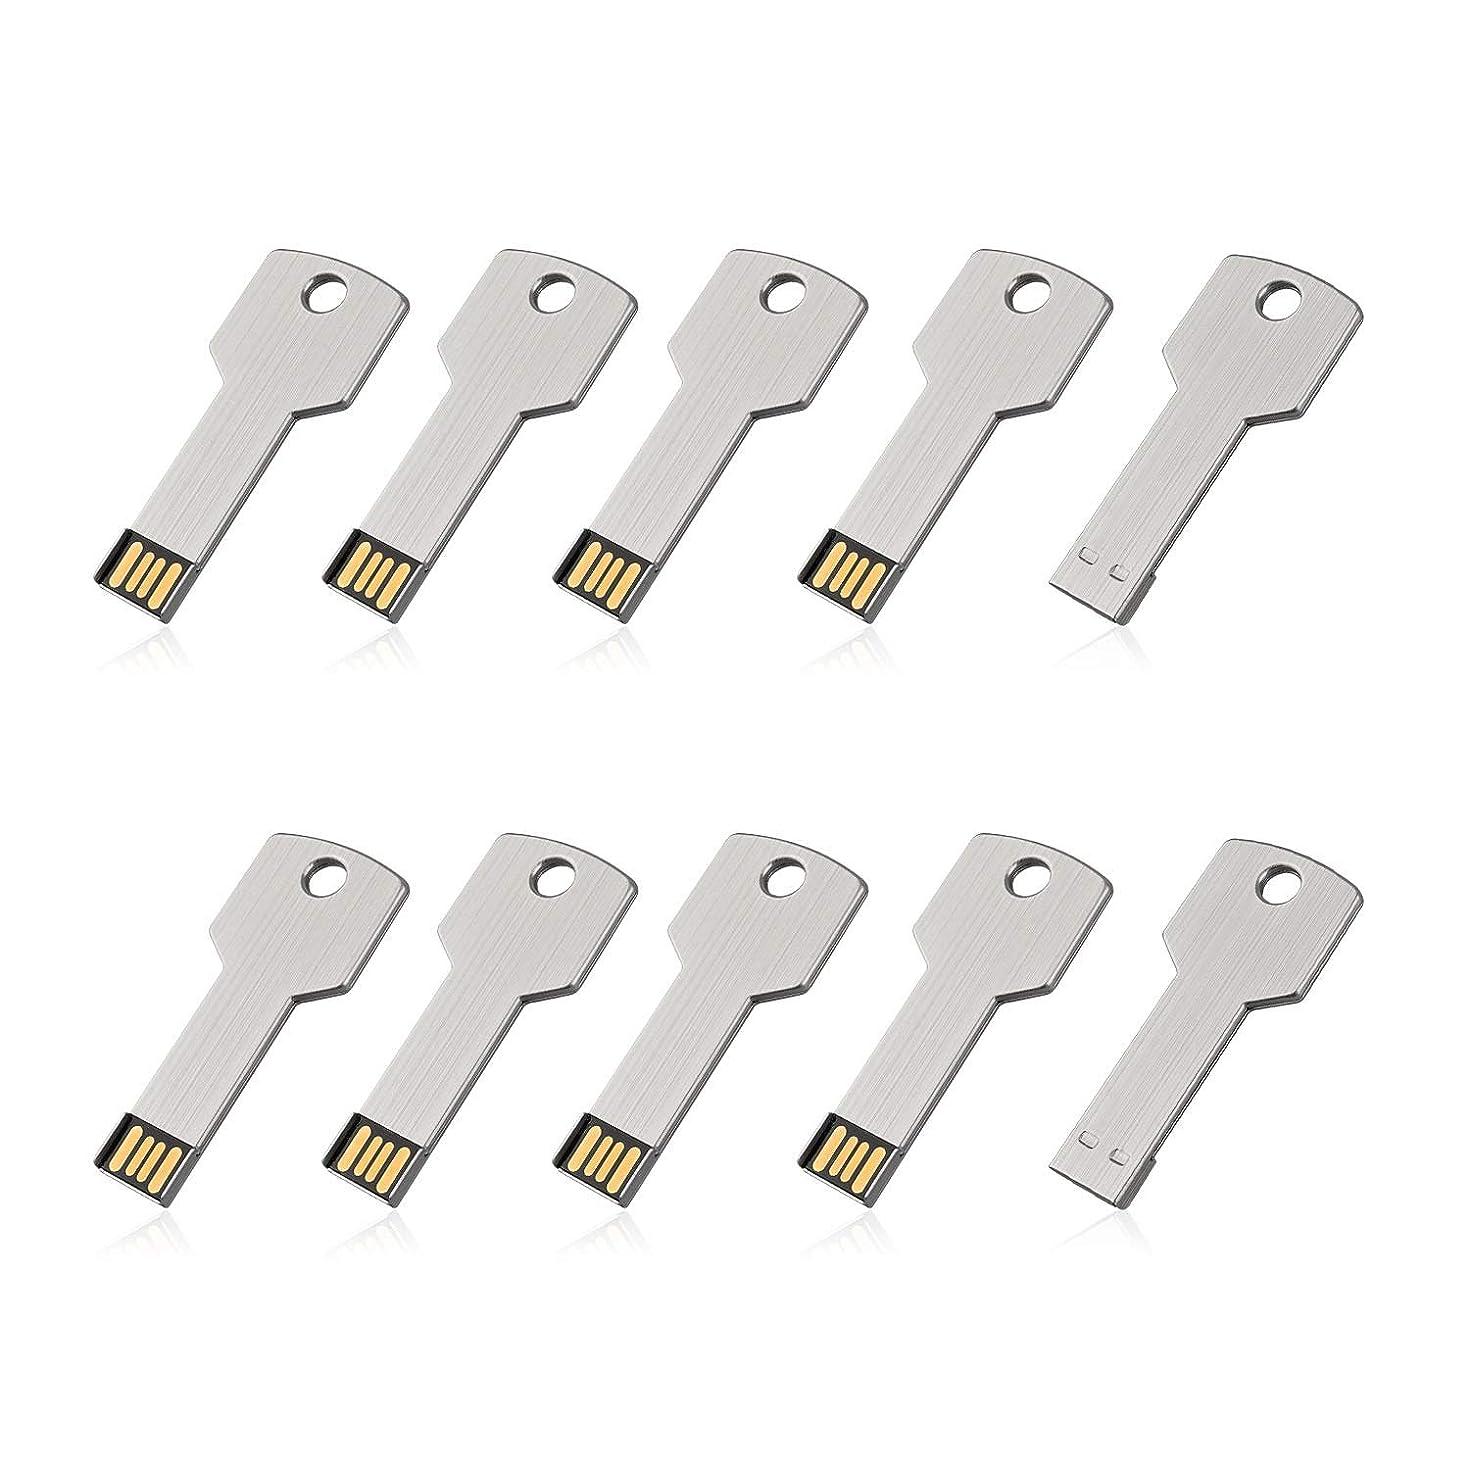 RAOYI 10Pack 32GB USB Flash Drive Metal Memory Stick Thumb Drives Jump Drive Key Shaped 32G, USB 2.0 Stick Sliver